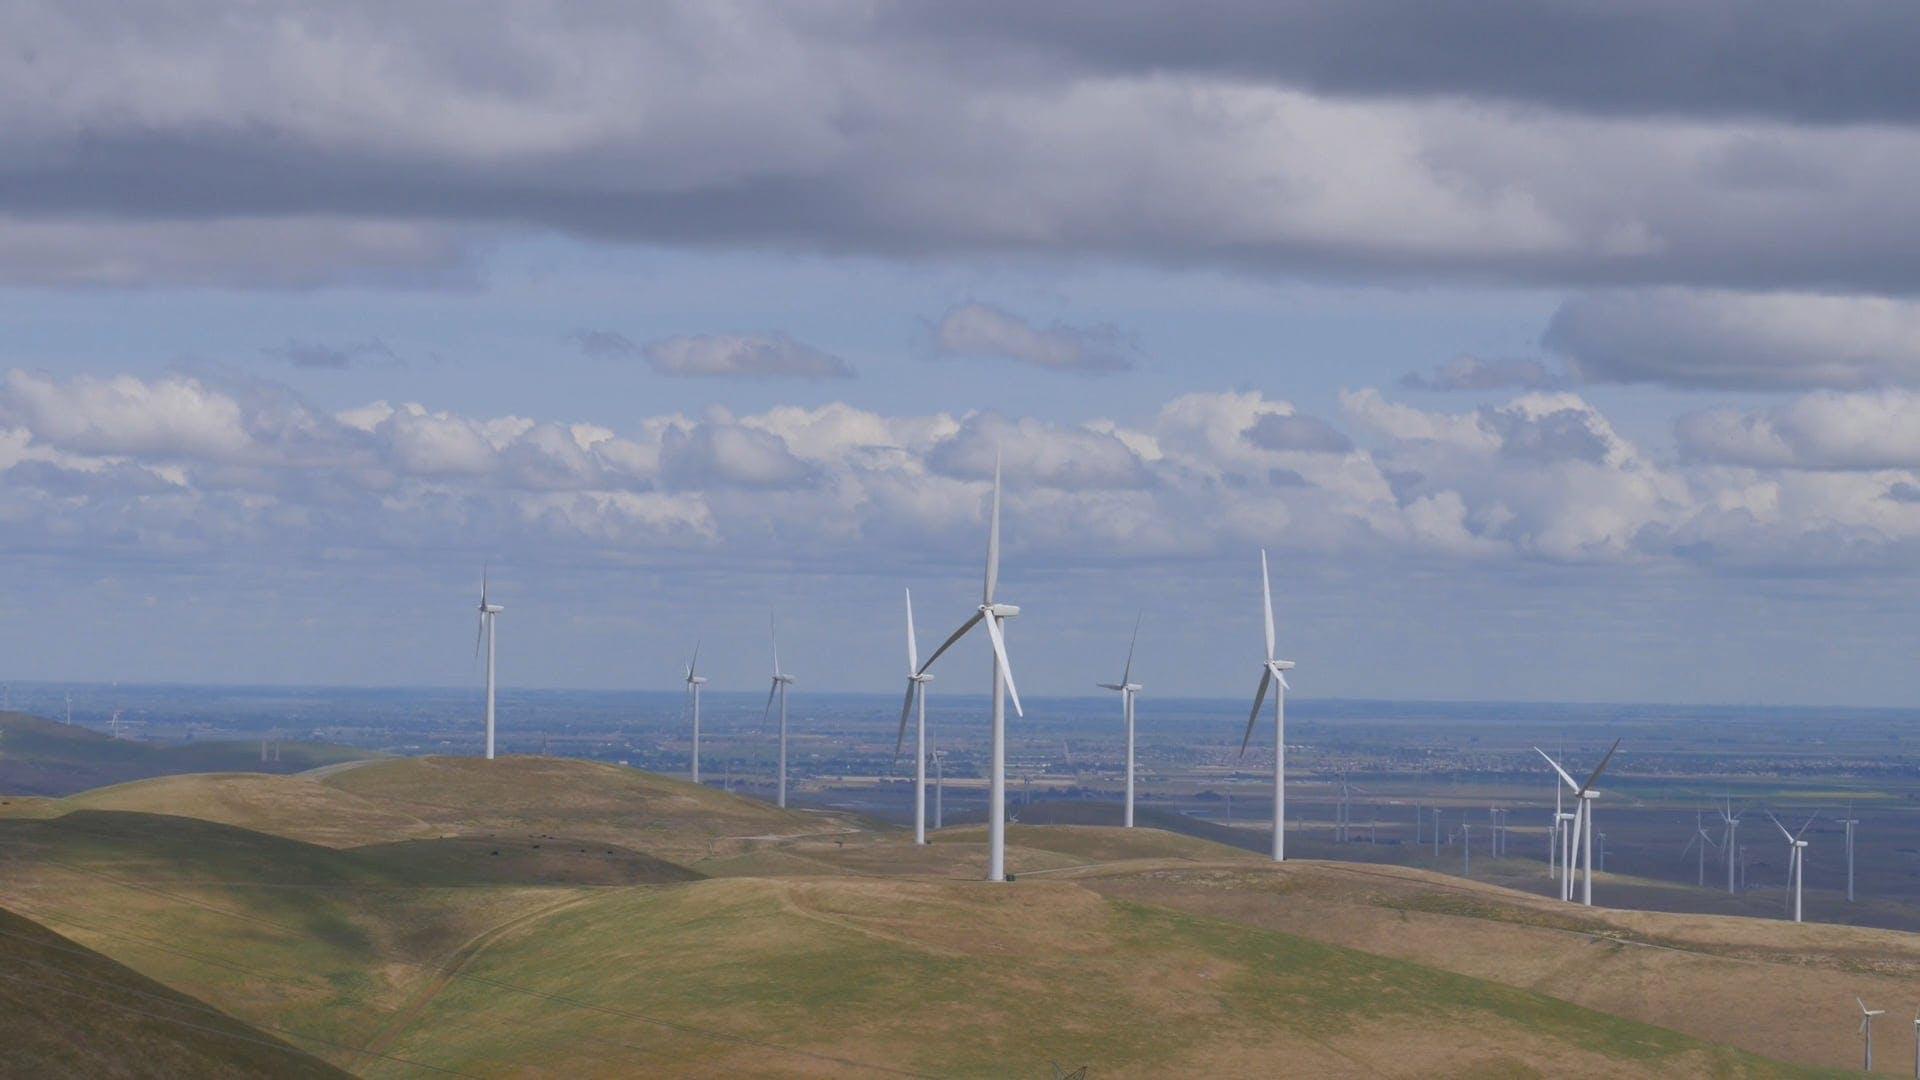 A Beautiful View Of Wind Turbines